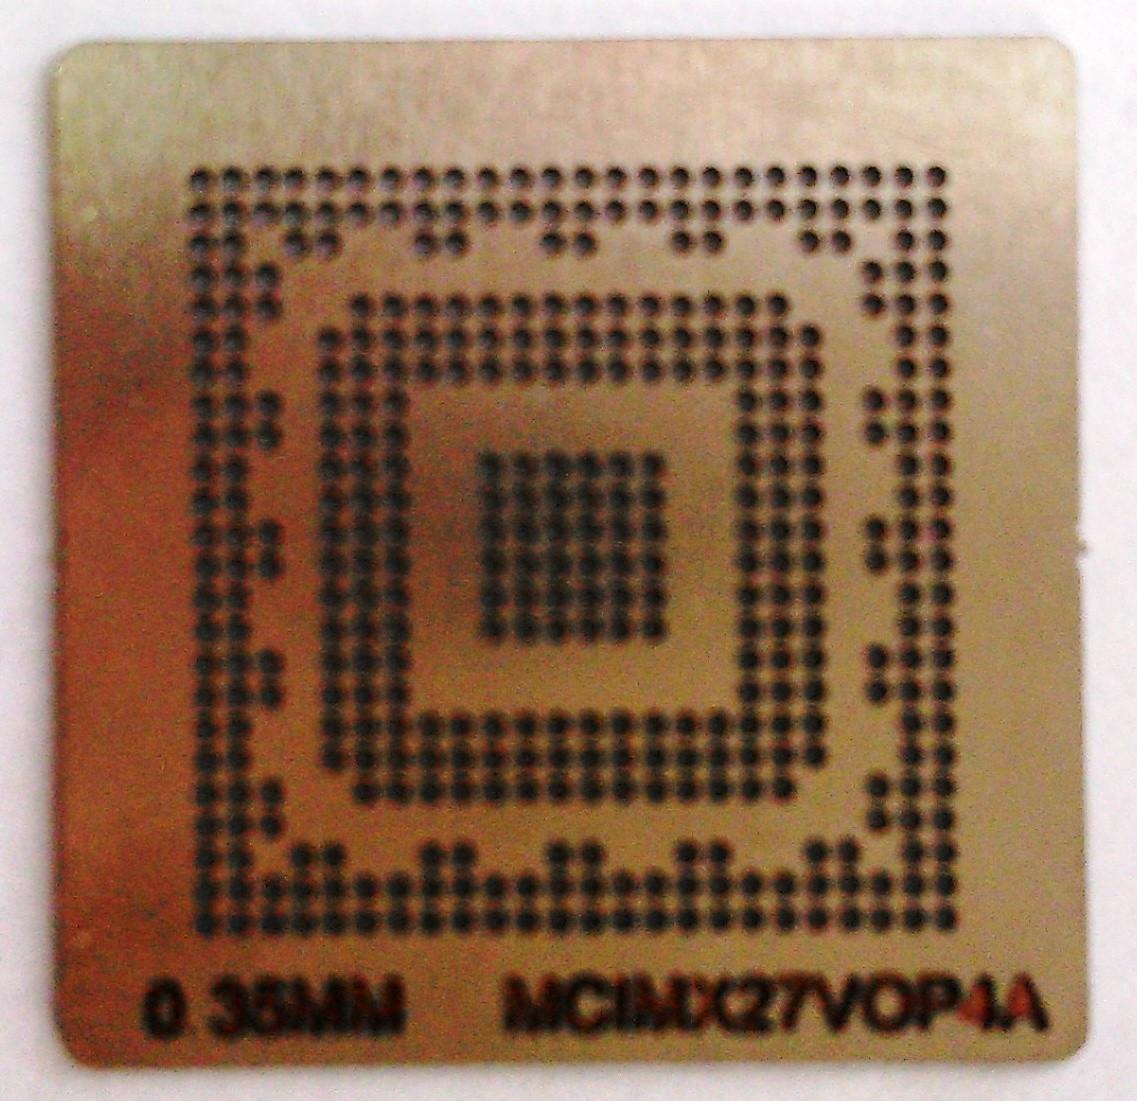 BGA трафарет 0,35mm MCIMX27VOP4A